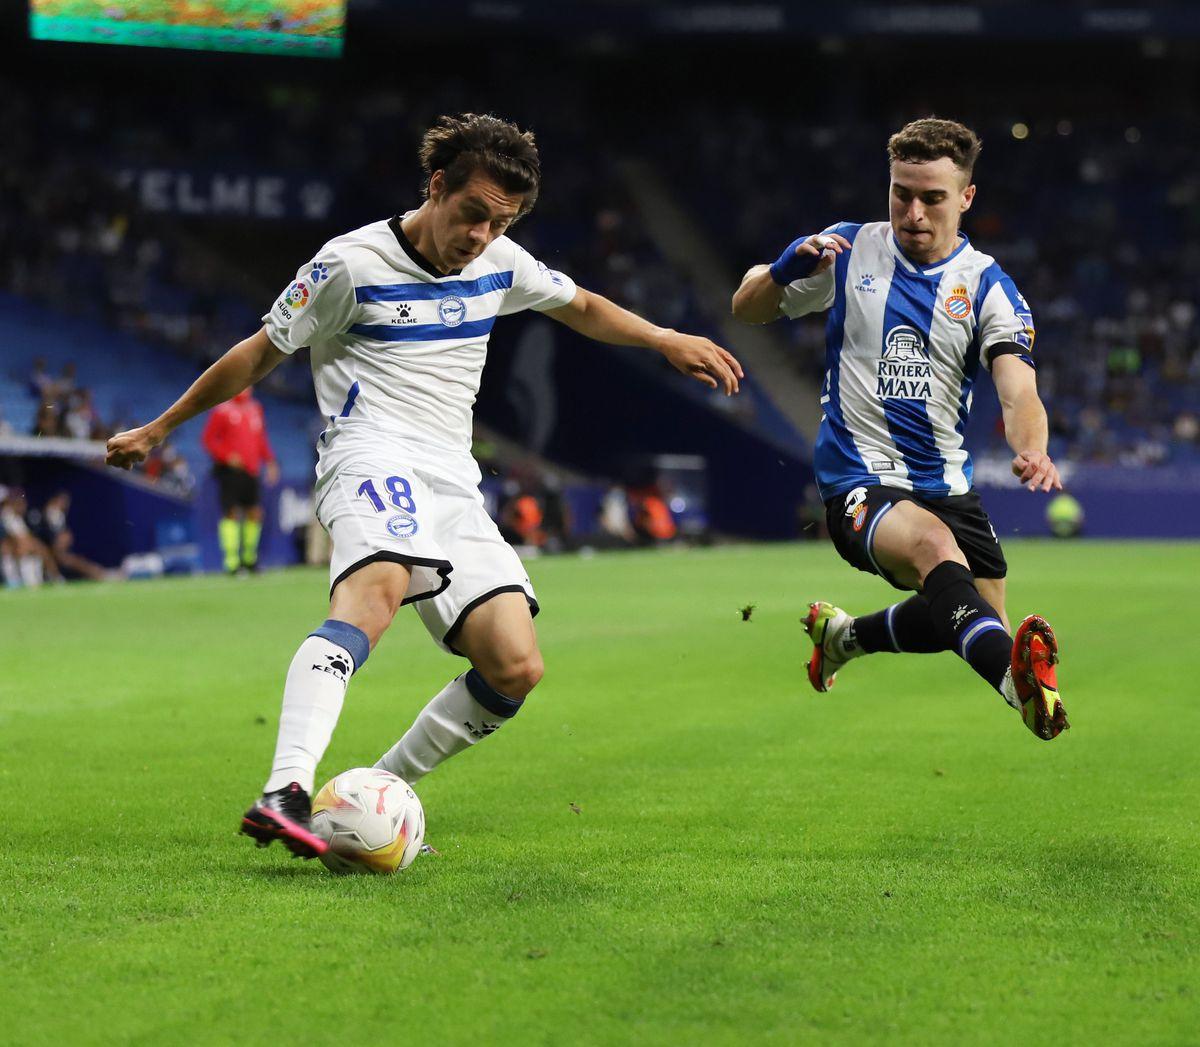 RCD Espanyol v Deportivo Alaves - LaLiga Santander